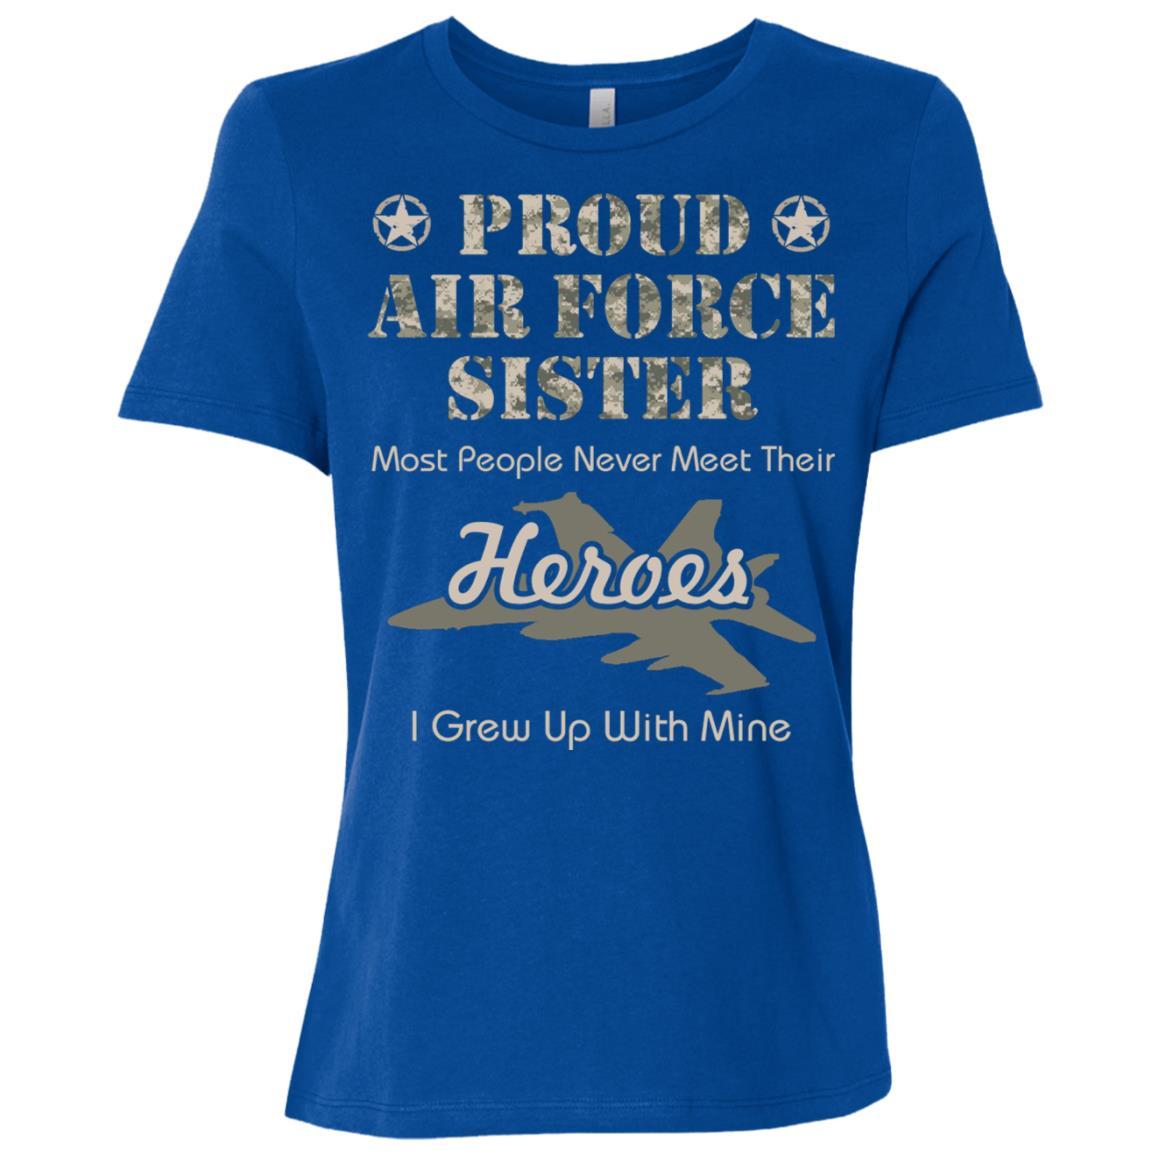 Proud Air Force Sister Women Short Sleeve T-Shirt